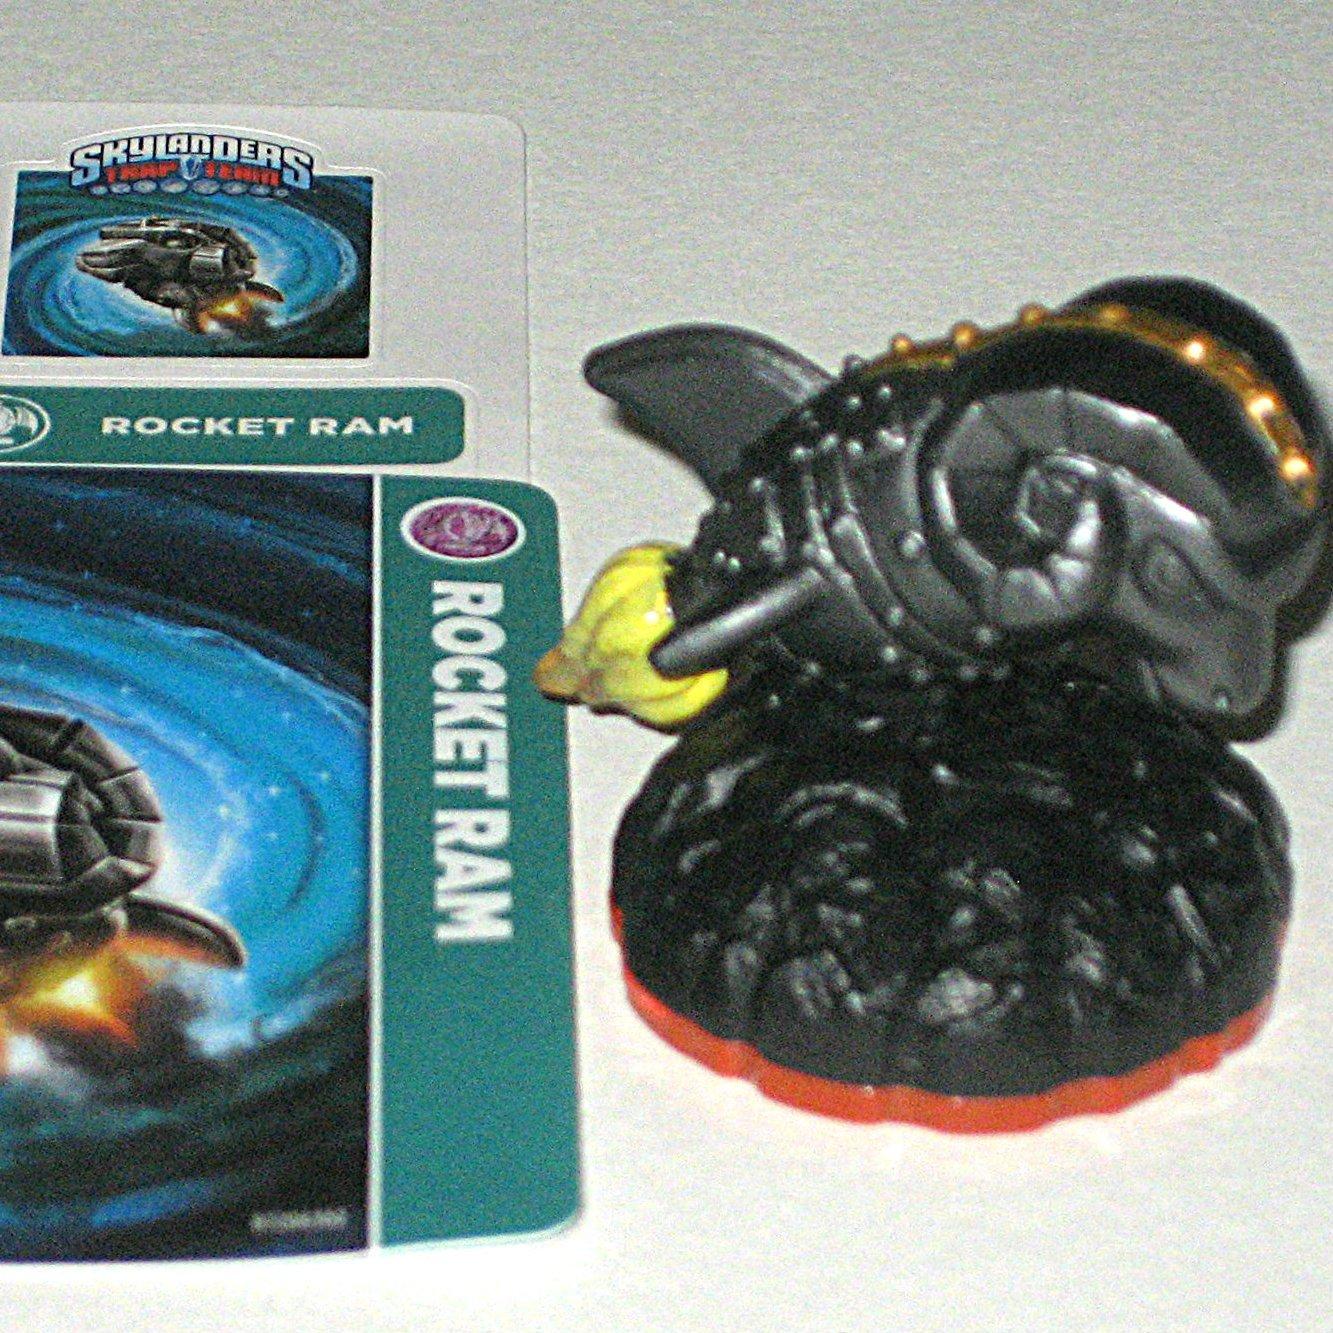 Rocket Ram Skylanders Trap Team Figure (includes card and code, no retail package)